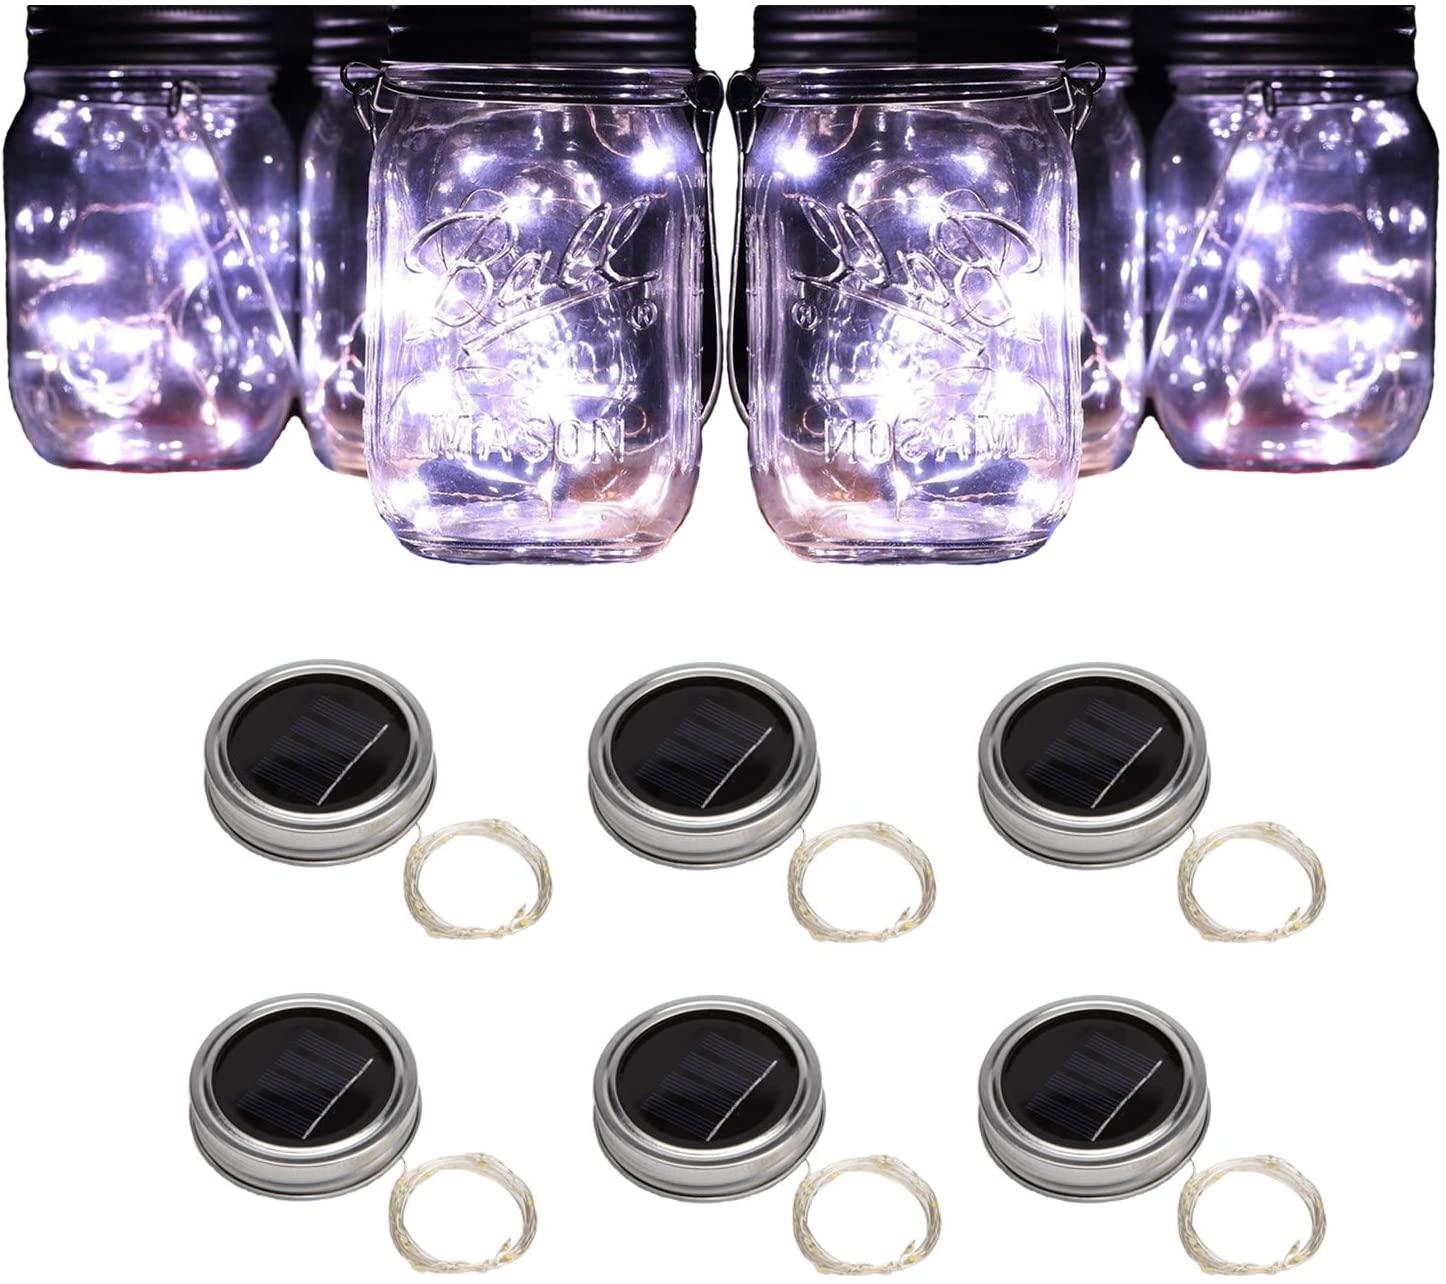 Forthcan 6 Pack Solar Mason Jar Lights, 10 Led String Fairy Firefly Lights Lids Insert for Regular Mouth Jars, Mason Jar,Patio,Lawn,Garden Decor (Mason Jar & Handle Not Included) (6, White)